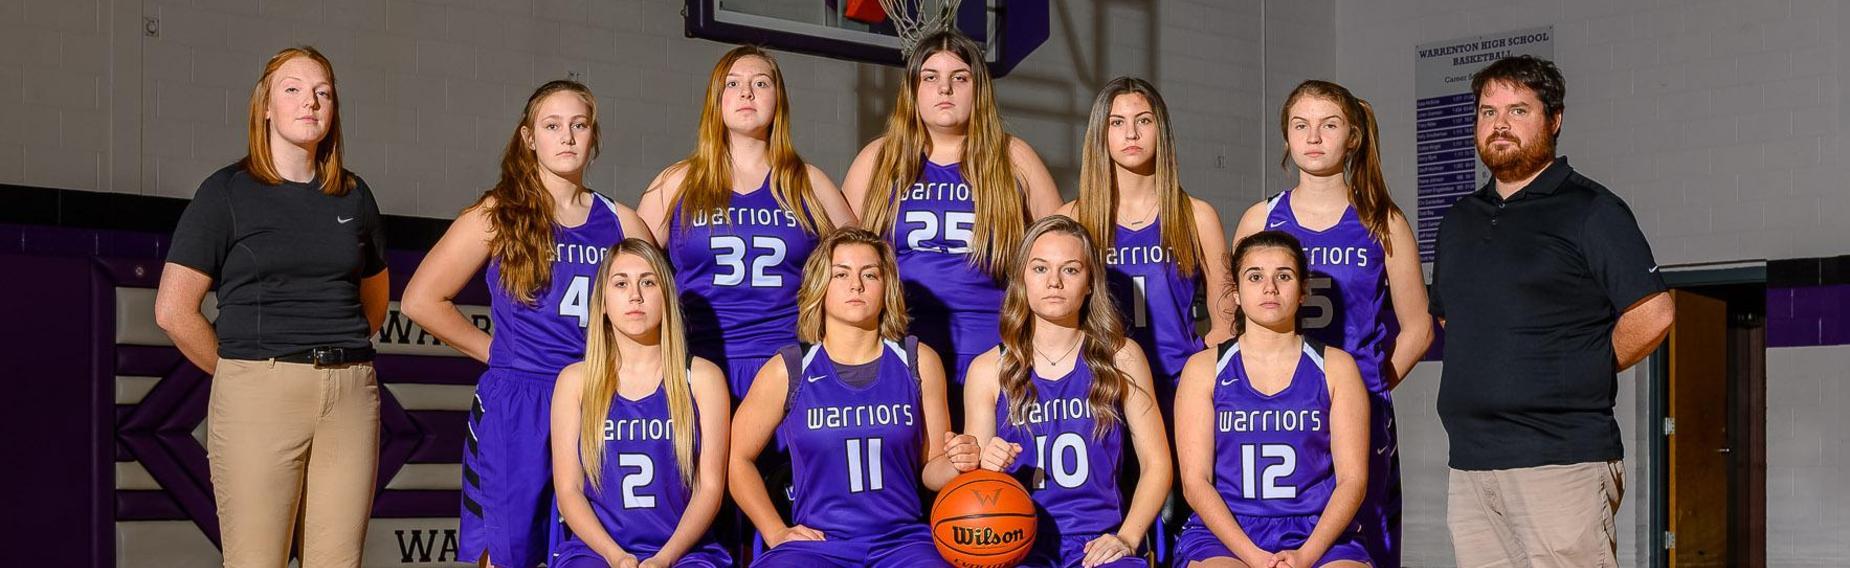 Girl's Basketball Team Photo